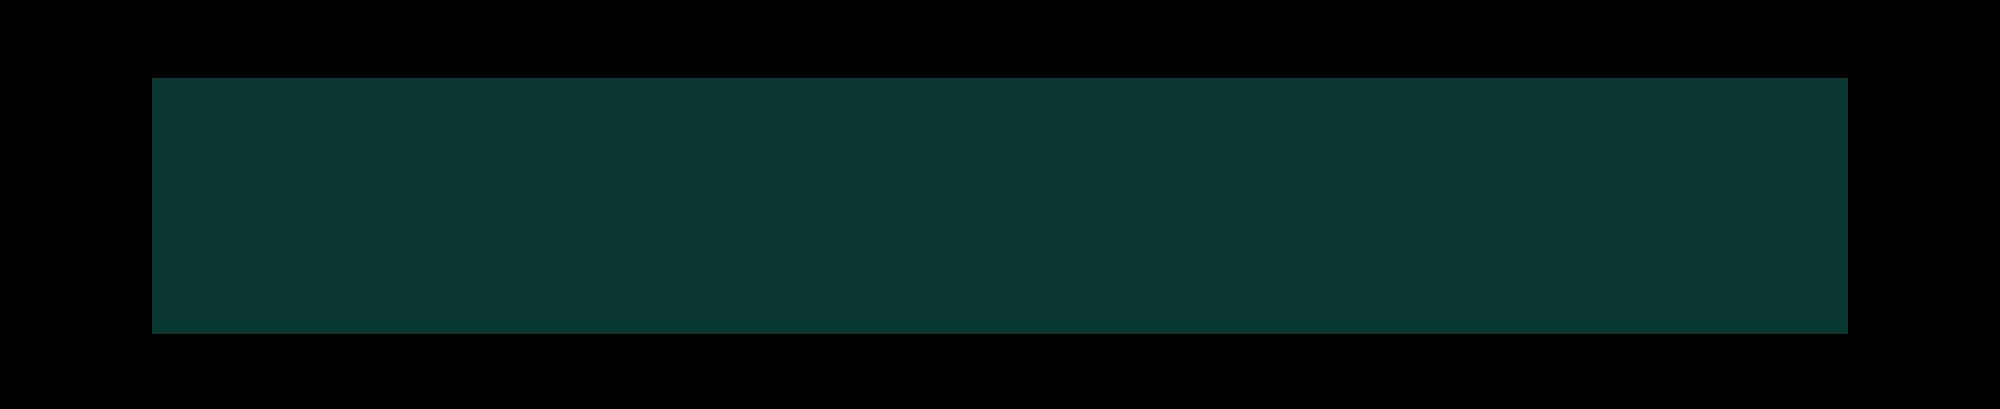 Cameron Mitchell Restaurants Logo - Green